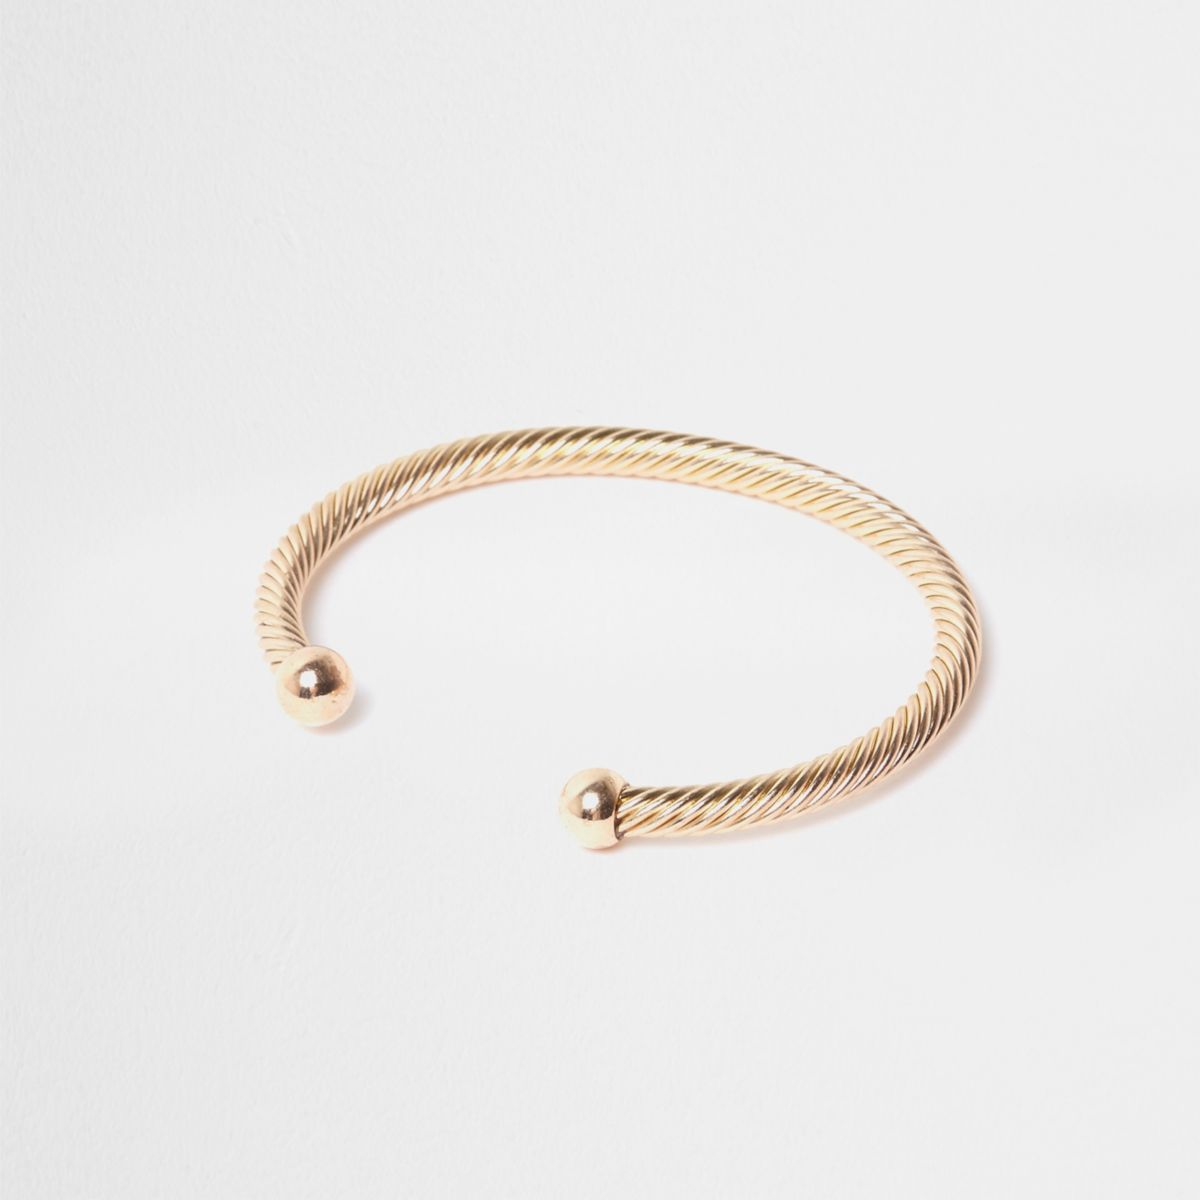 Gold tone twist cuff bracelet